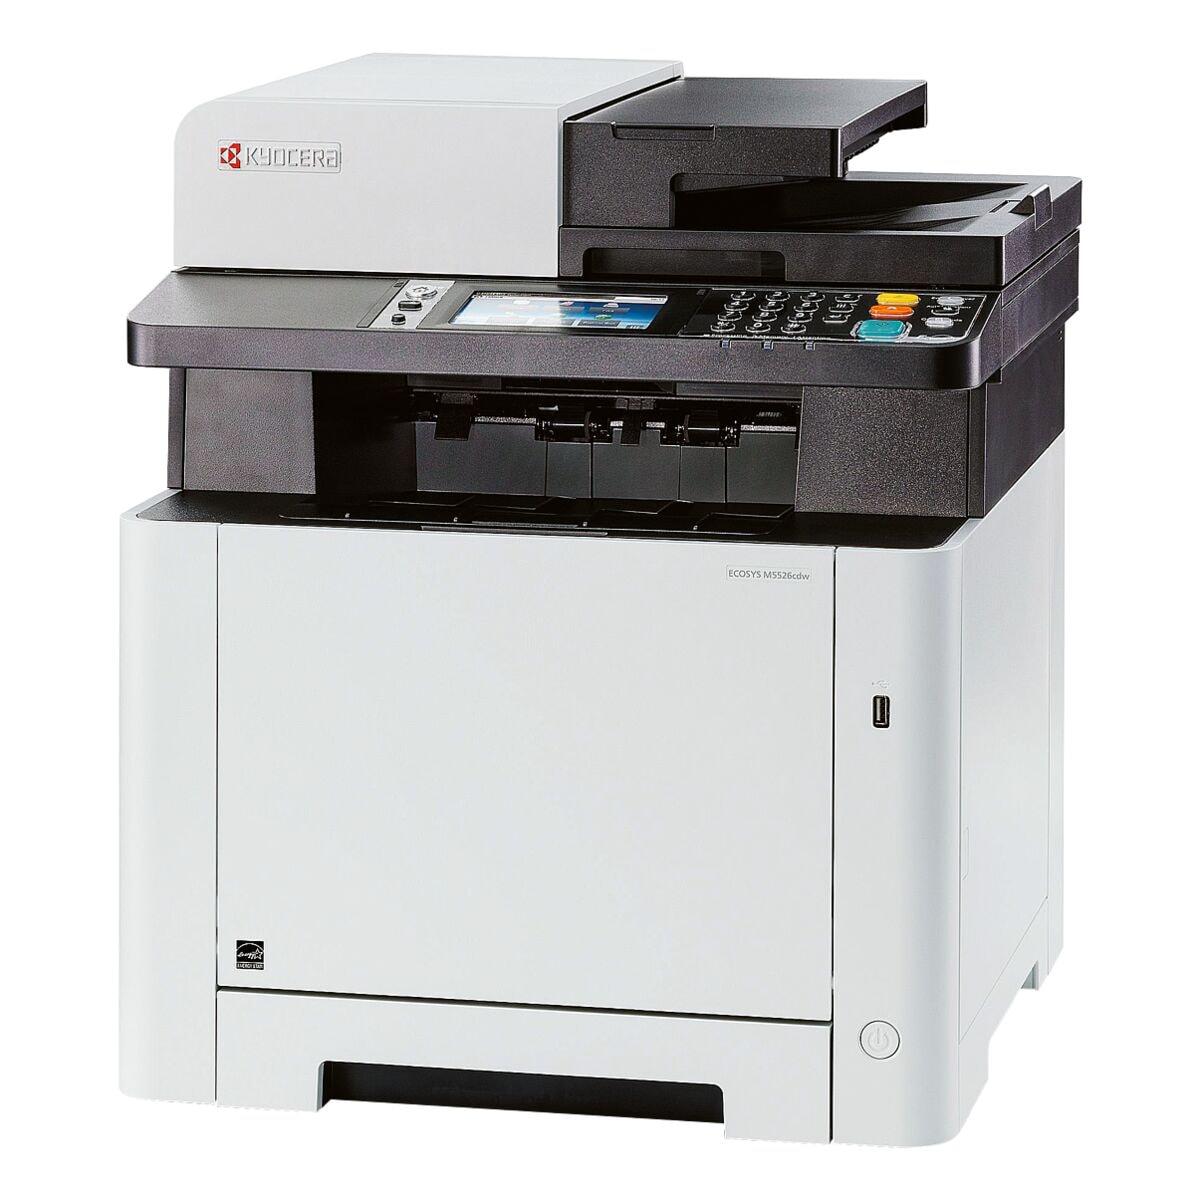 Kyocera Multifunktionsdrucker »ECOSYS M5526cdw«